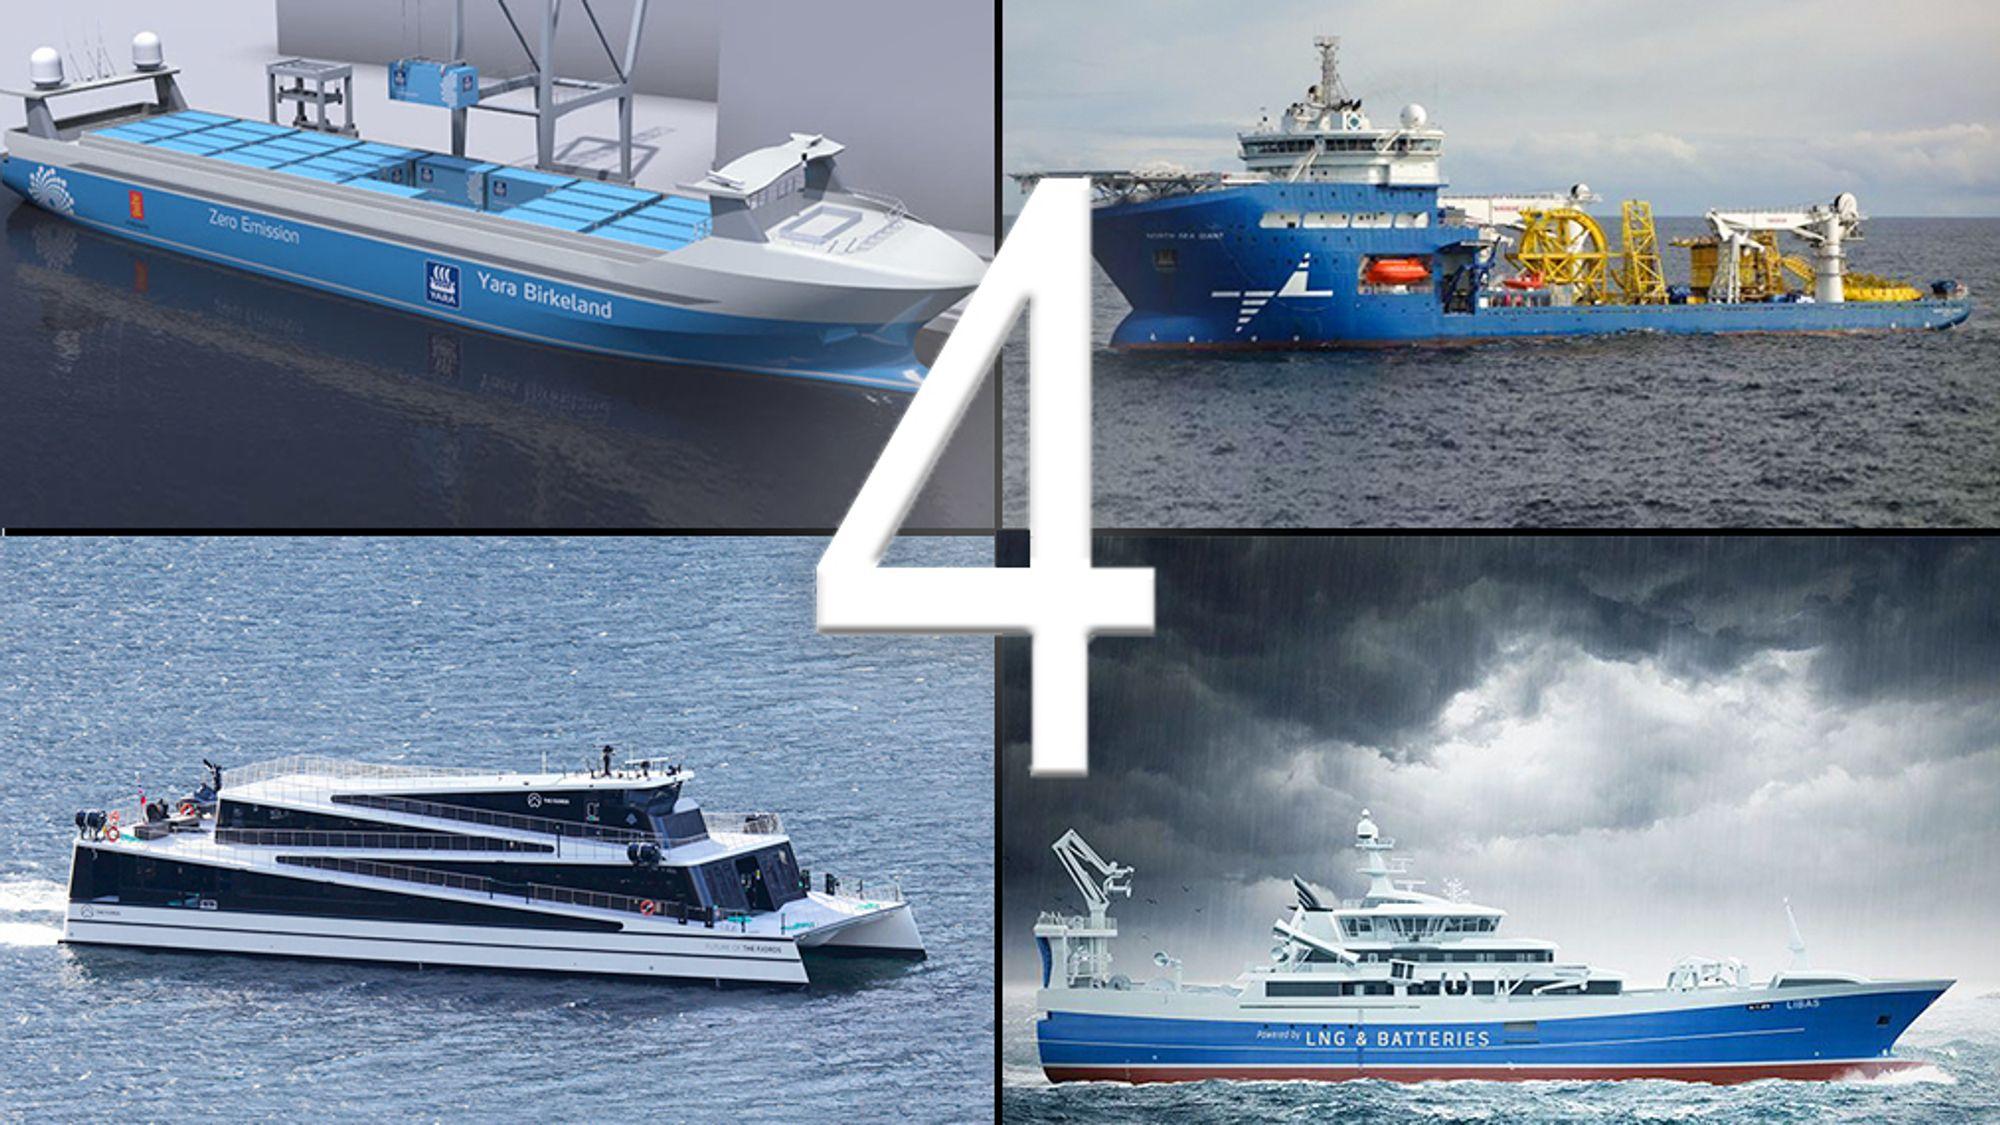 ANNONSE: 4 eksempler på norsk batteri-brillianse